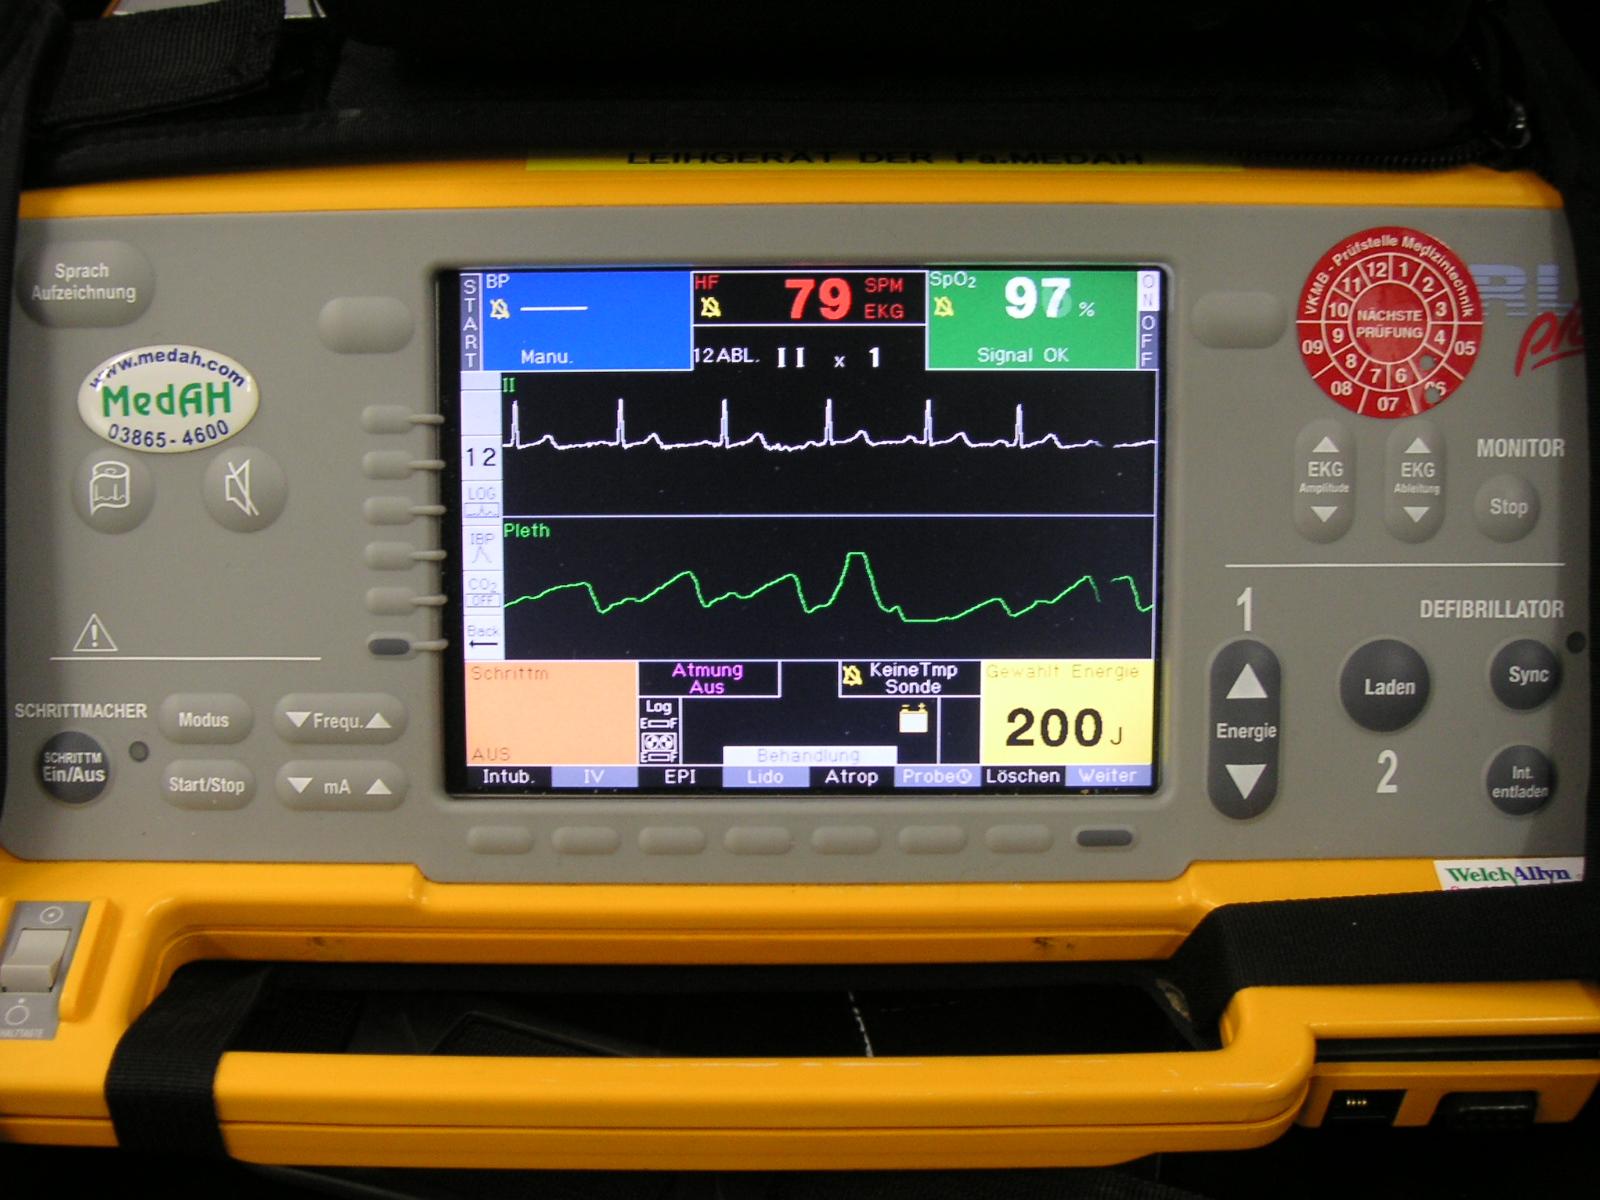 File:Defibrillator Monitor Closeup jpg - Wikimedia Commons